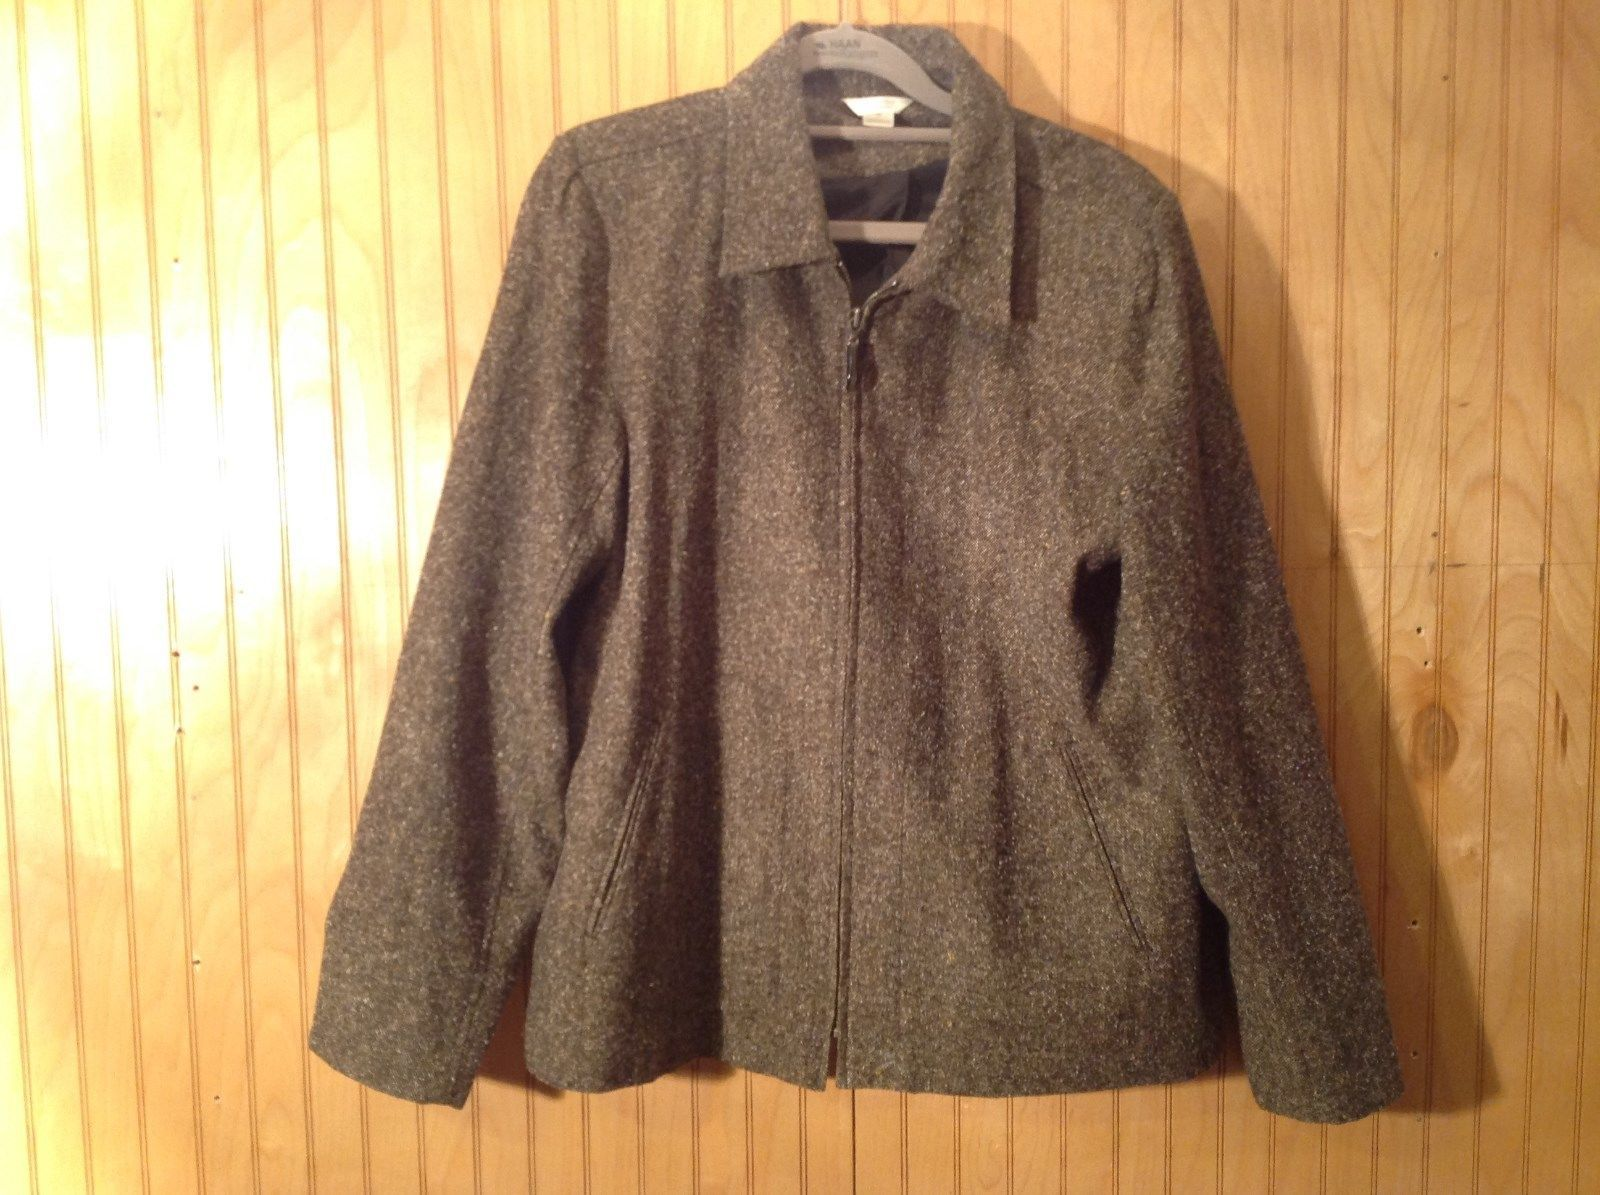 Gray Zipper Front Lined Jacket Christopher and Banks Adjustable Back Size Medium